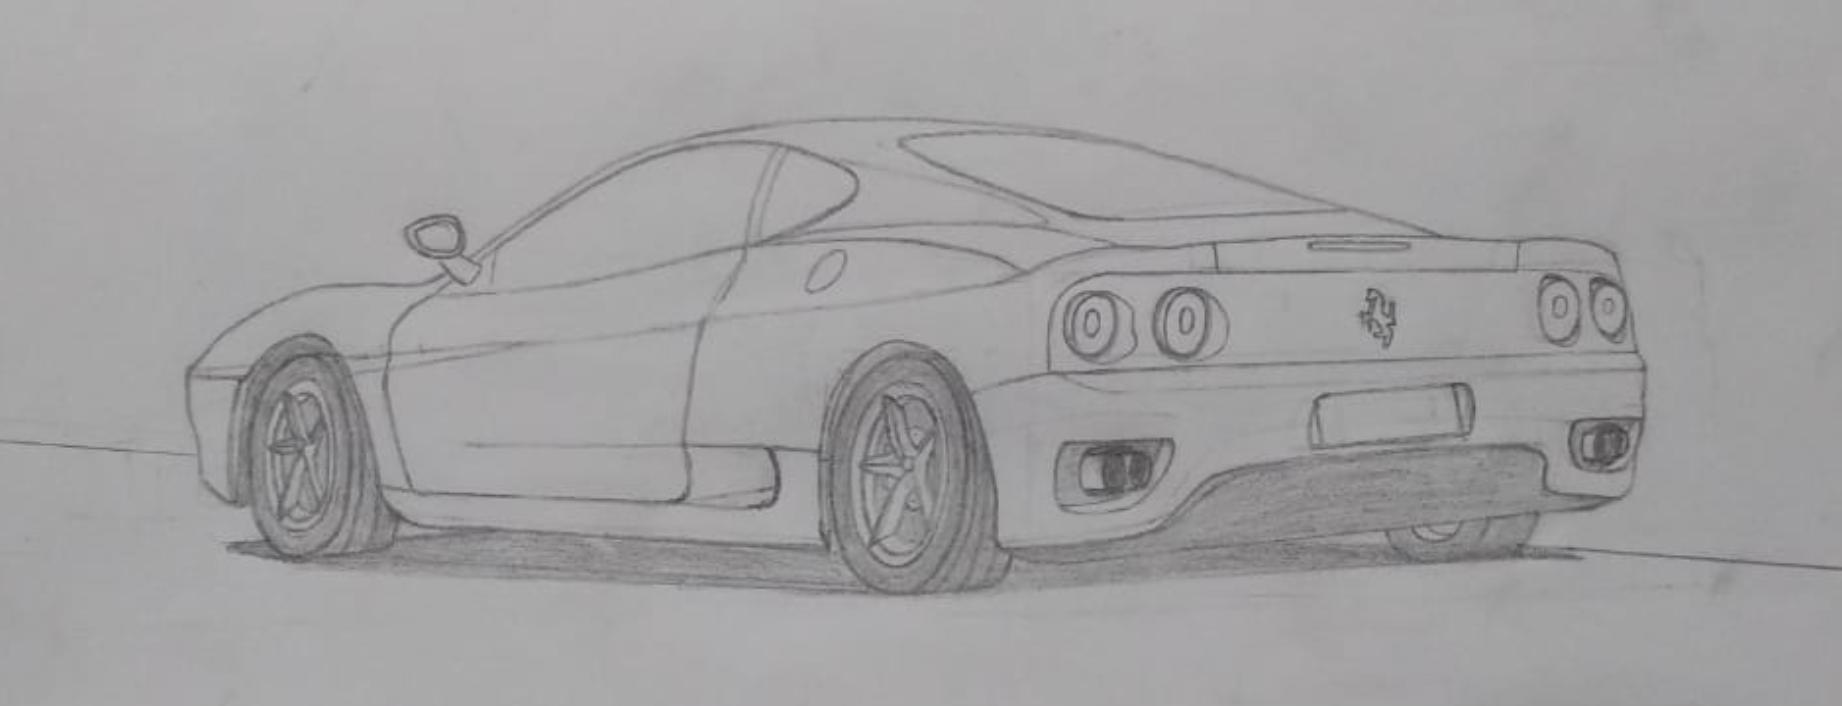 Ferrari 360 By Suzukiguy On Newgrounds